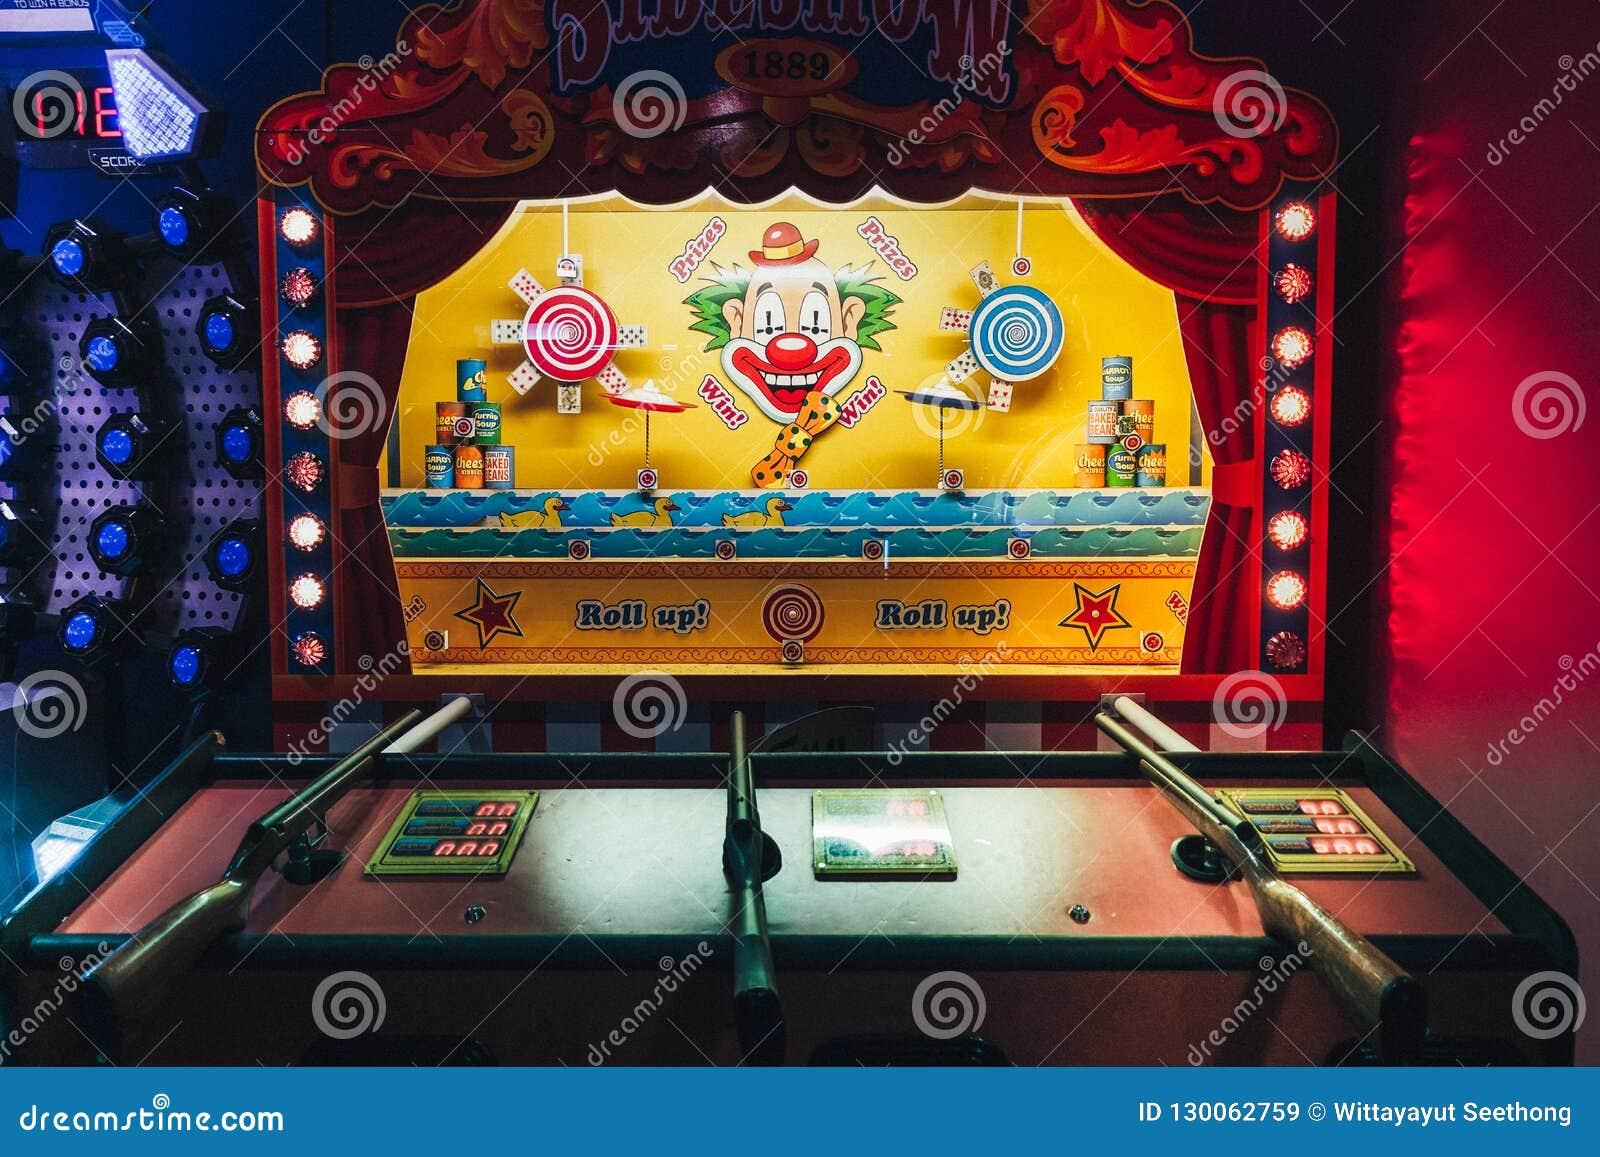 Arcada casino free download game for motorola atrix 2